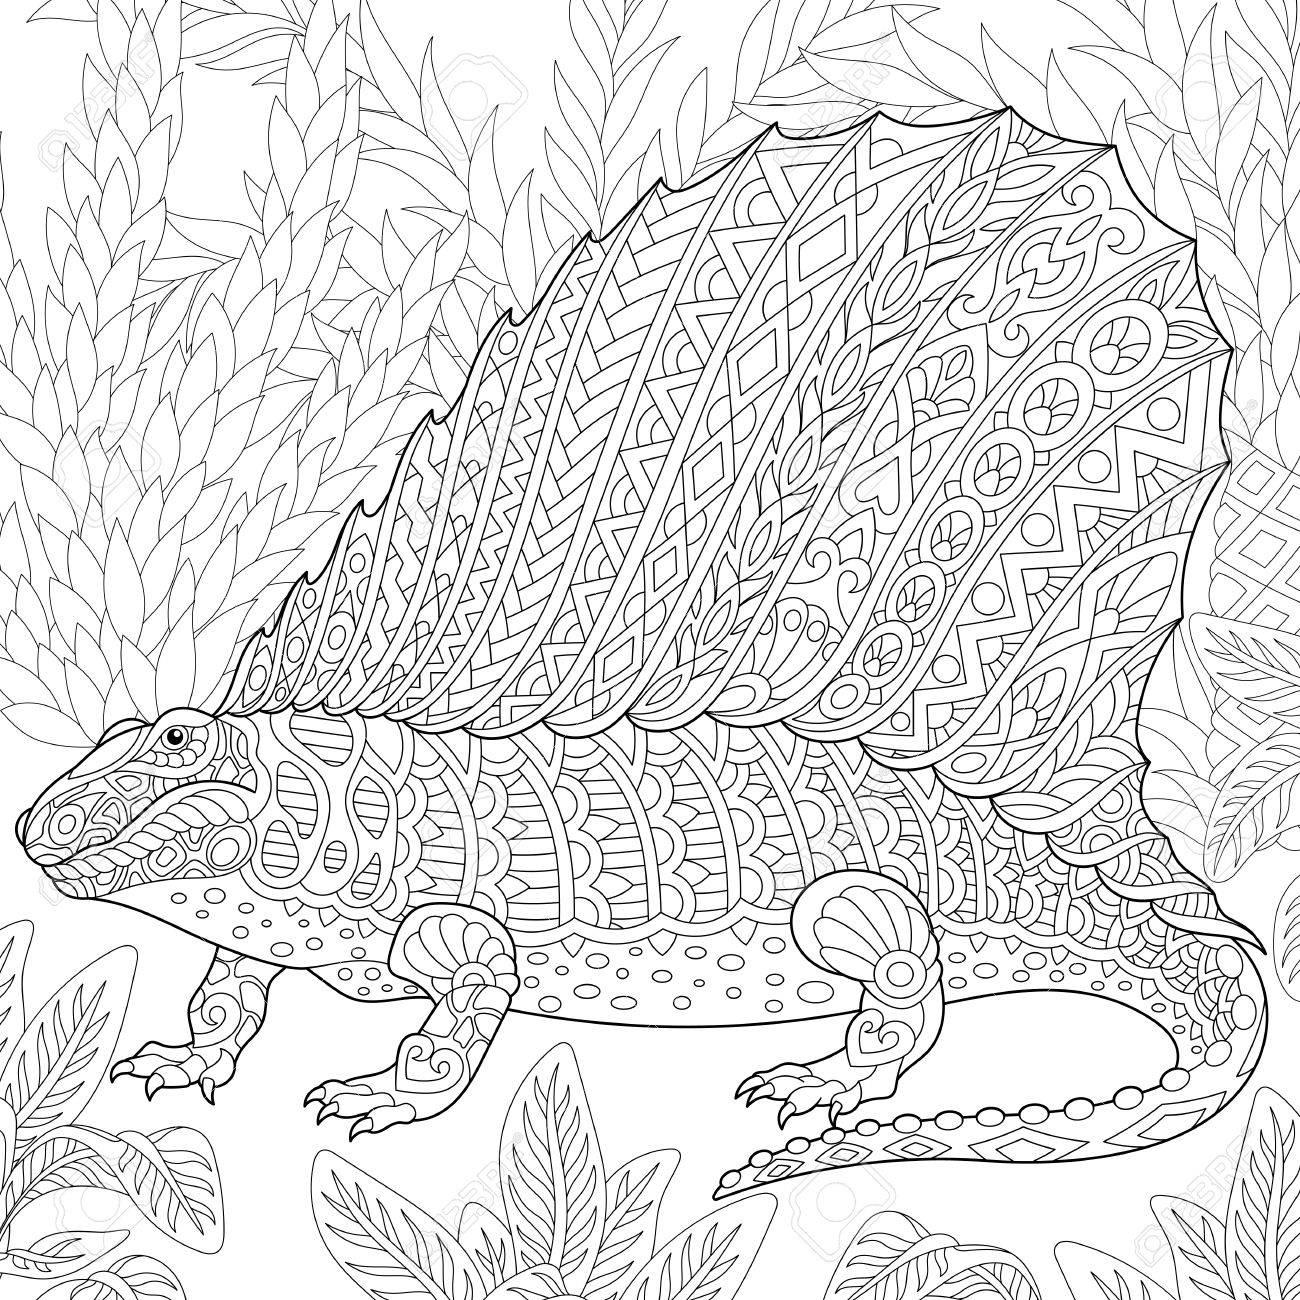 Dinosaurio Dimetrodon Estilizada, Reptil Fósil Del Período Pérmico ...